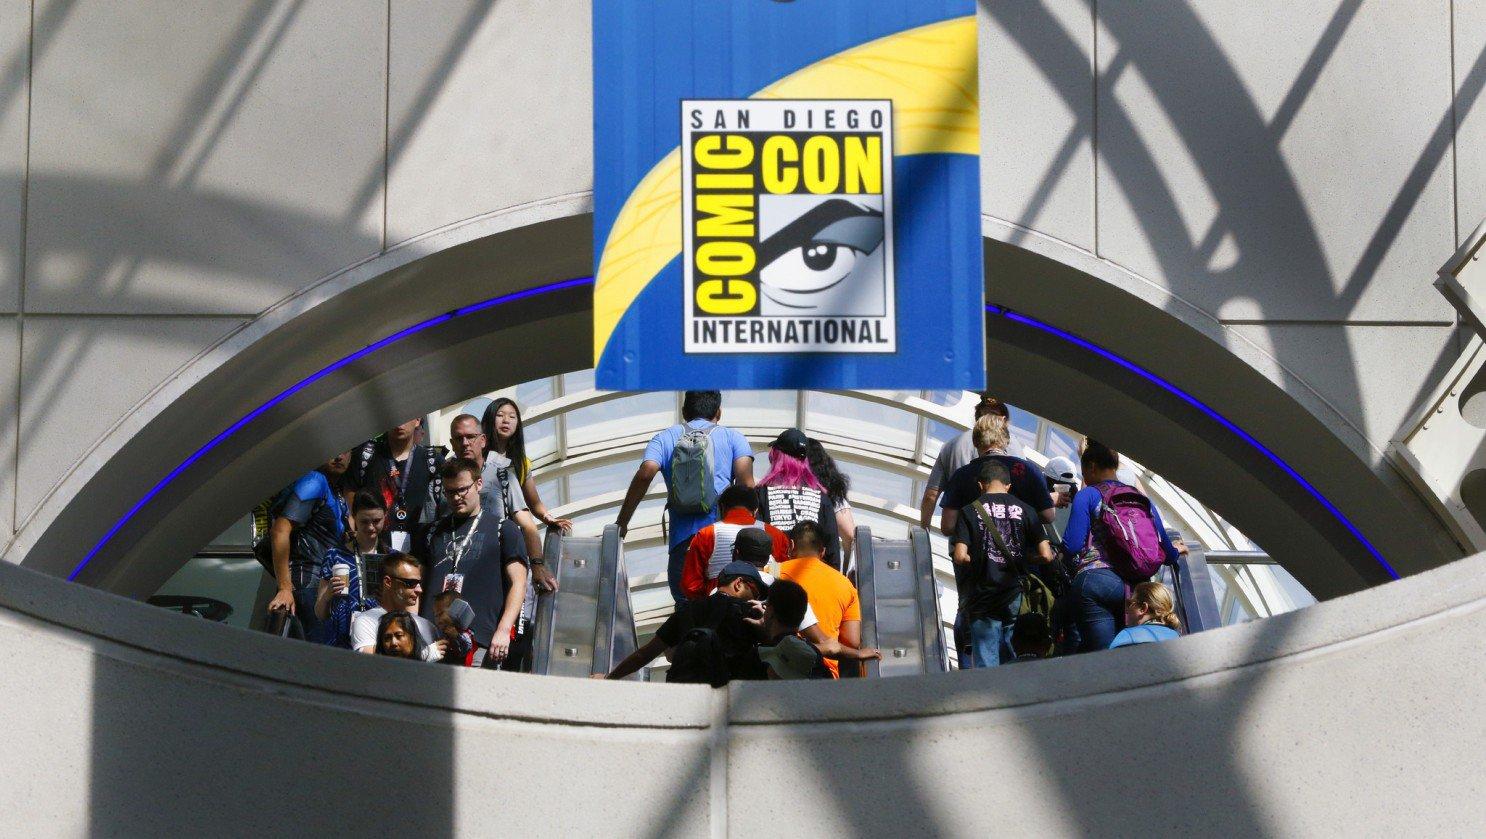 ComicCon San Diego International